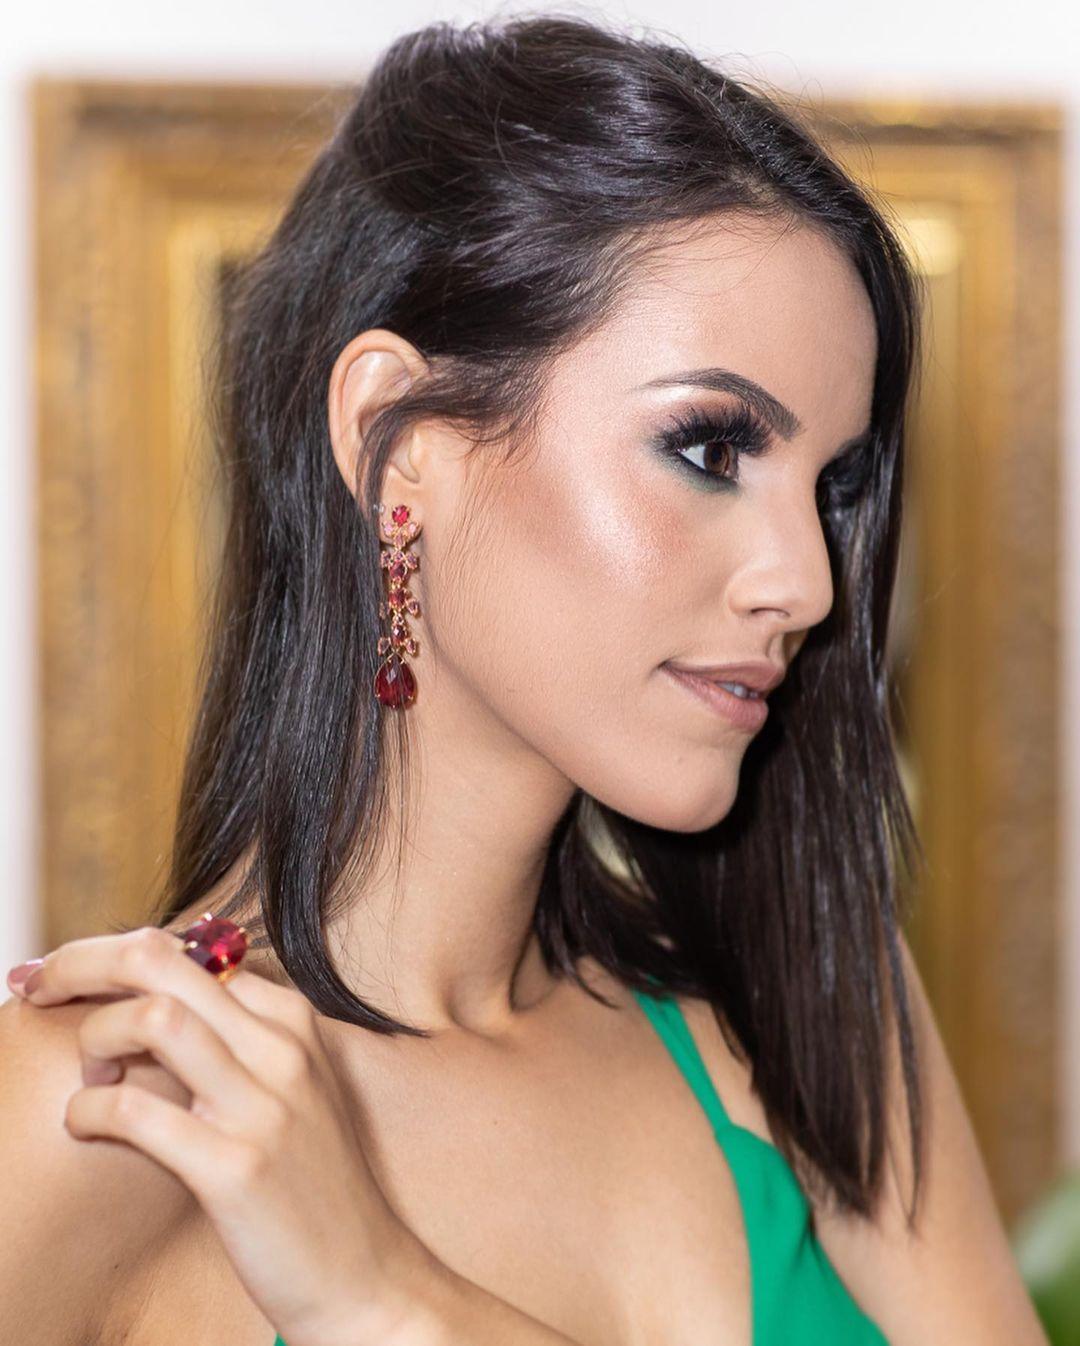 rafaella felipe, top 20 de miss brasil mundo 2019. - Página 9 74990612